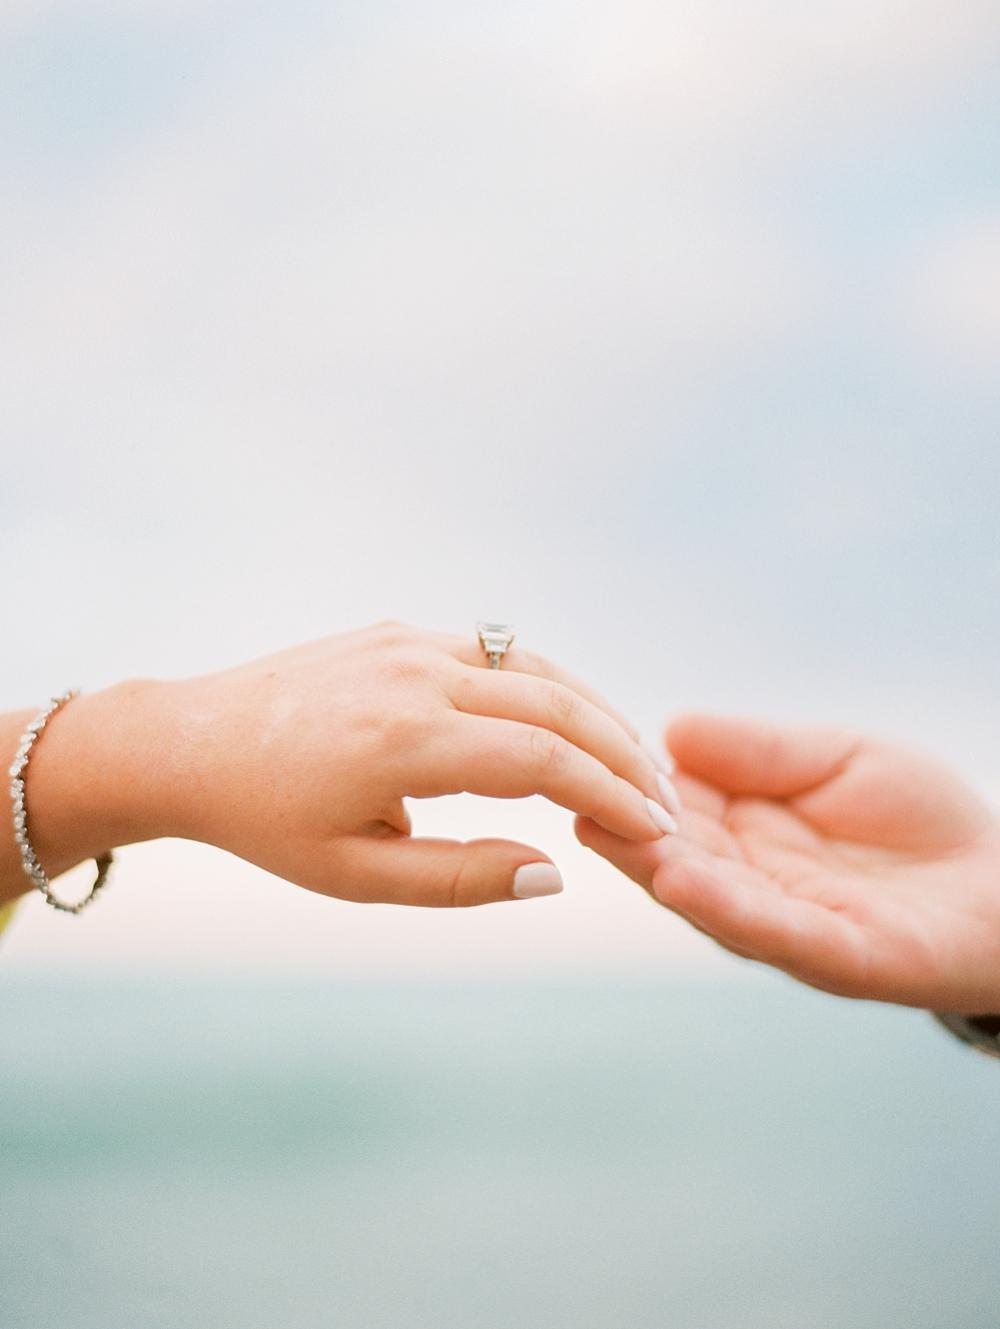 kristin-la-voie-photography-Chicago-Engagement-glencoe-beach-lake-michigan-113